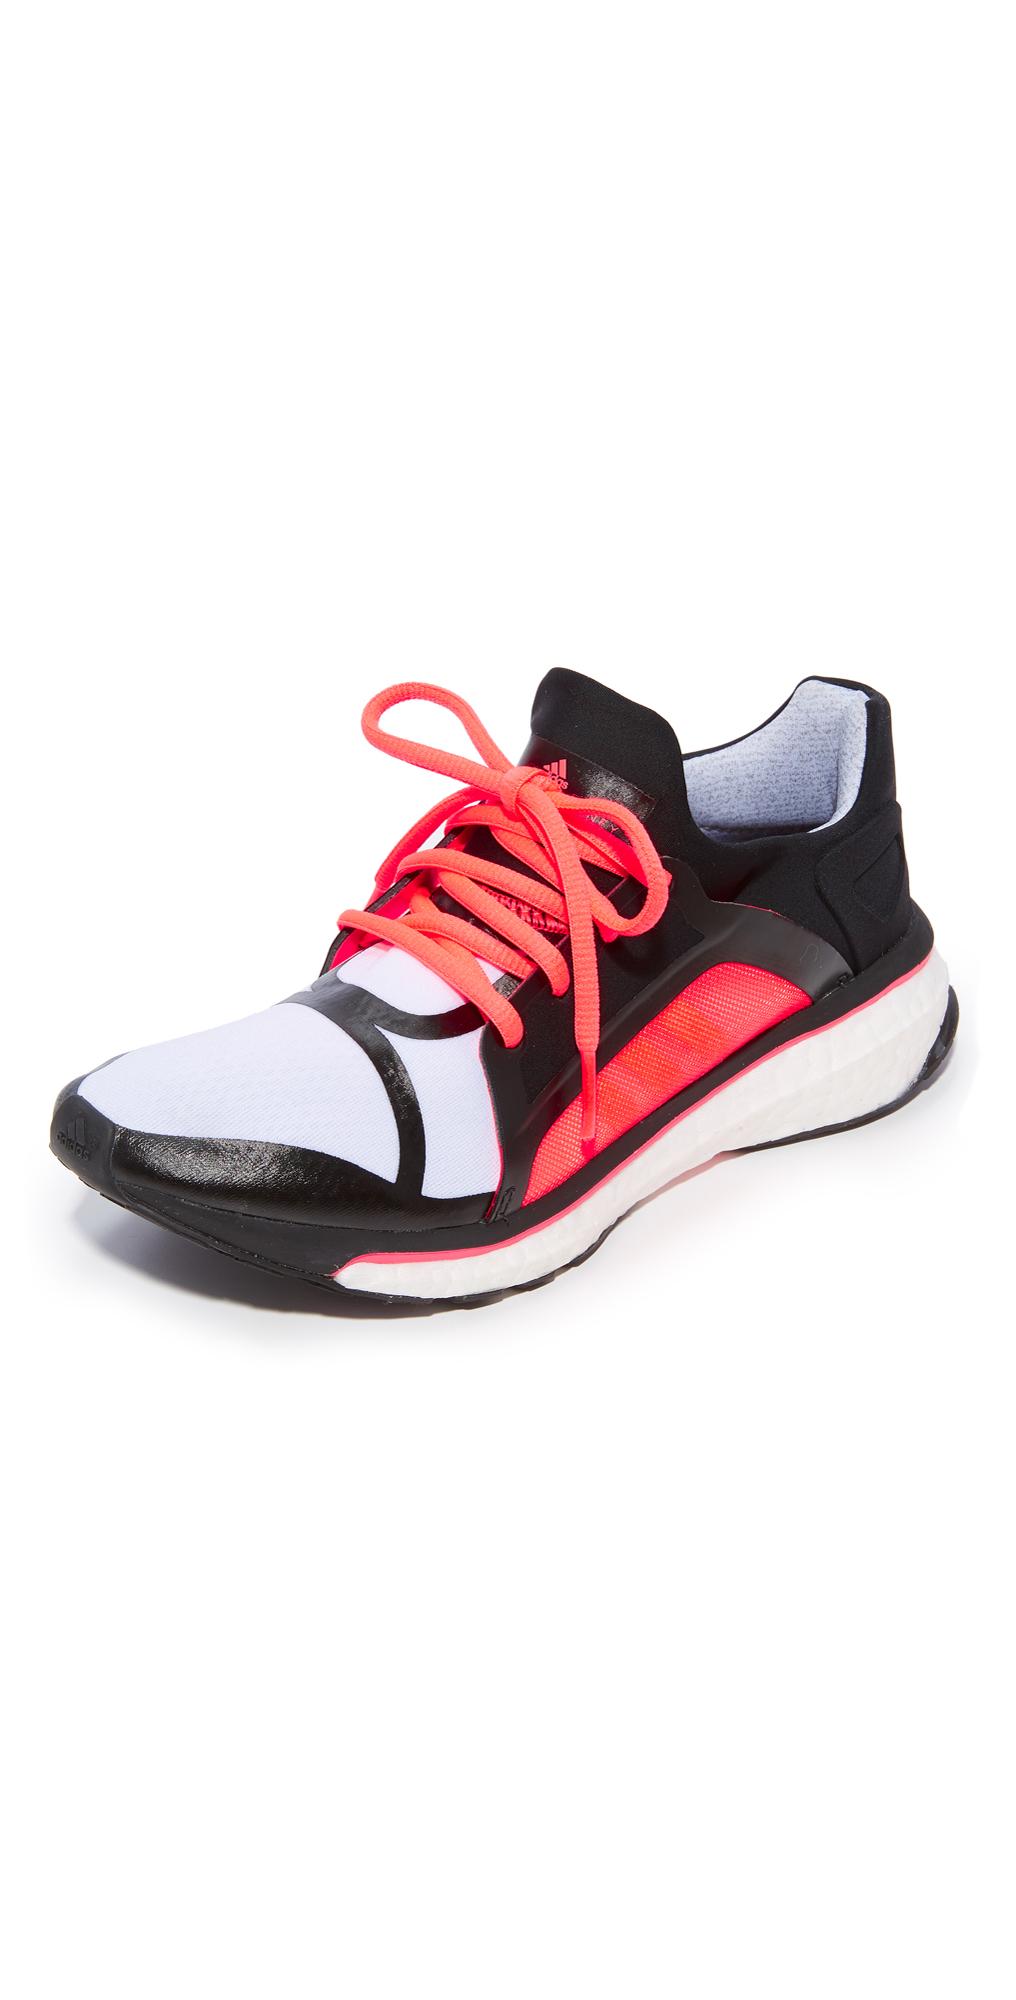 Energy Boost Sneakers adidas by Stella McCartney